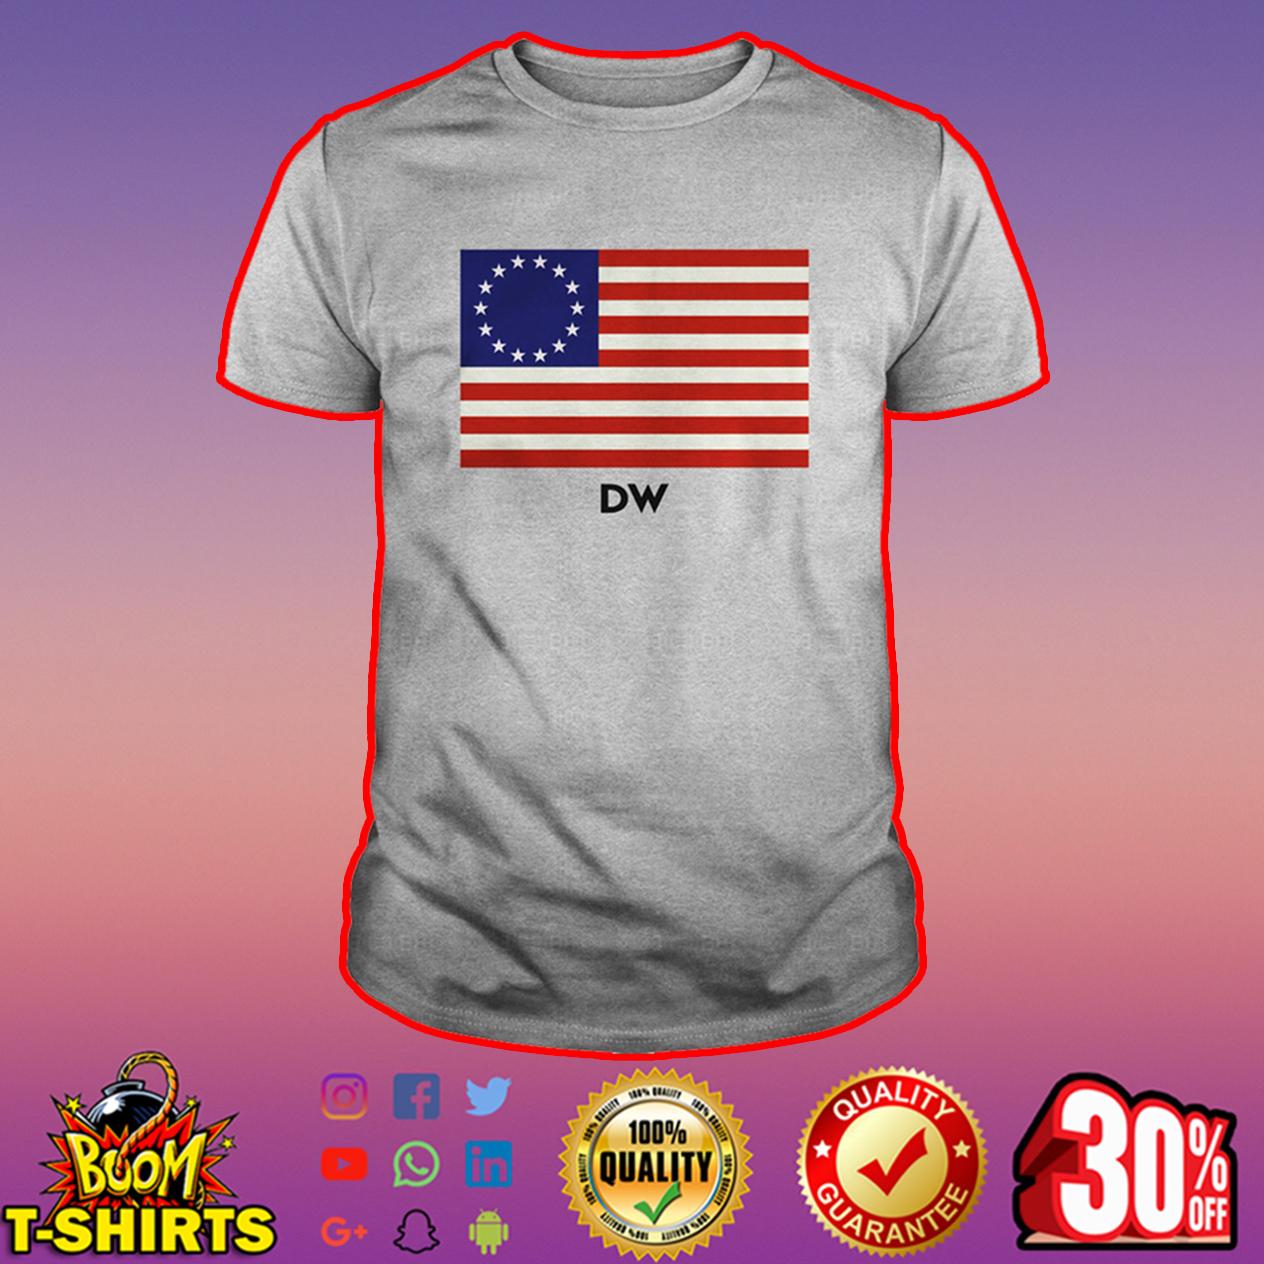 DW Betsy Ross flag shirt